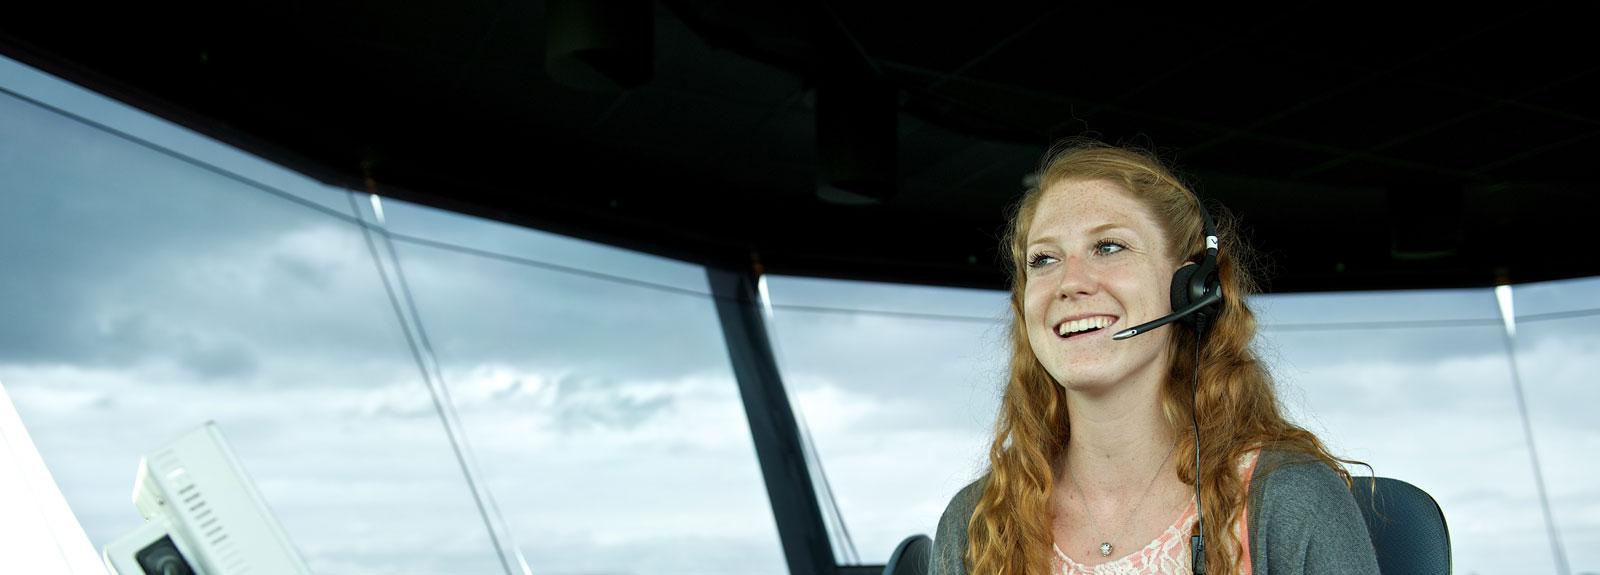 Smiling air traffic controller